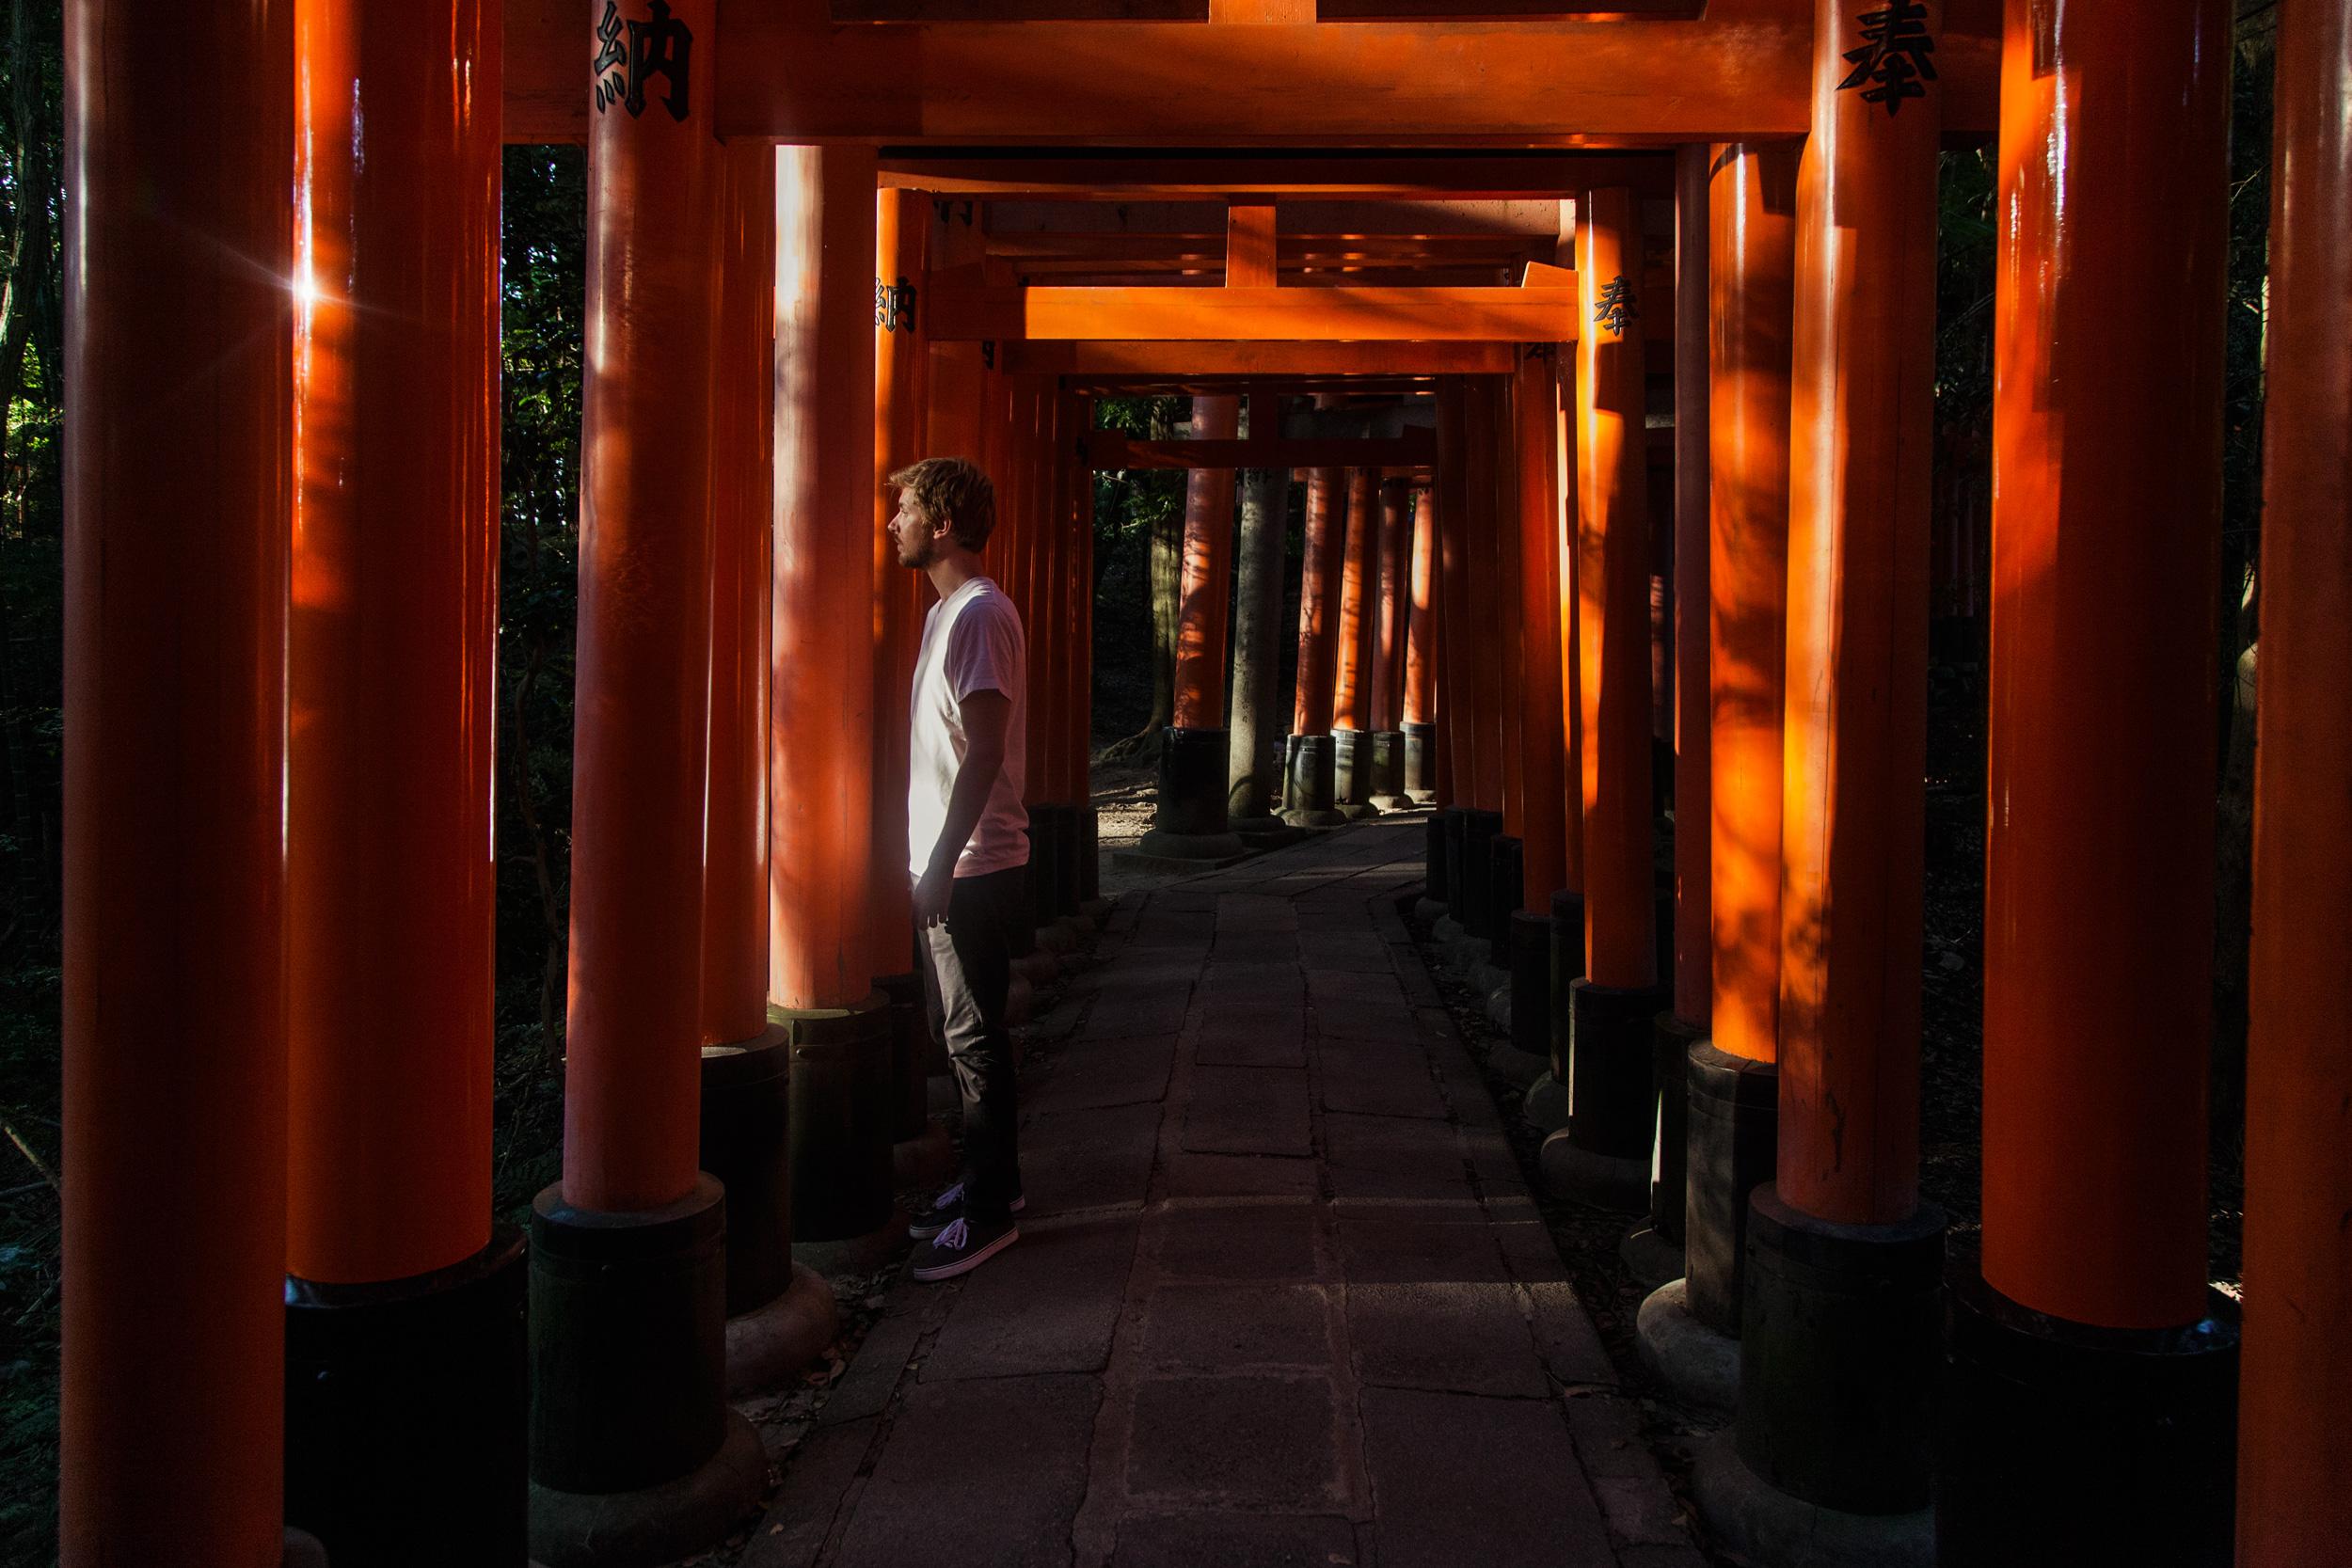 Fushimi Inari Taisha 伏見稲荷大社